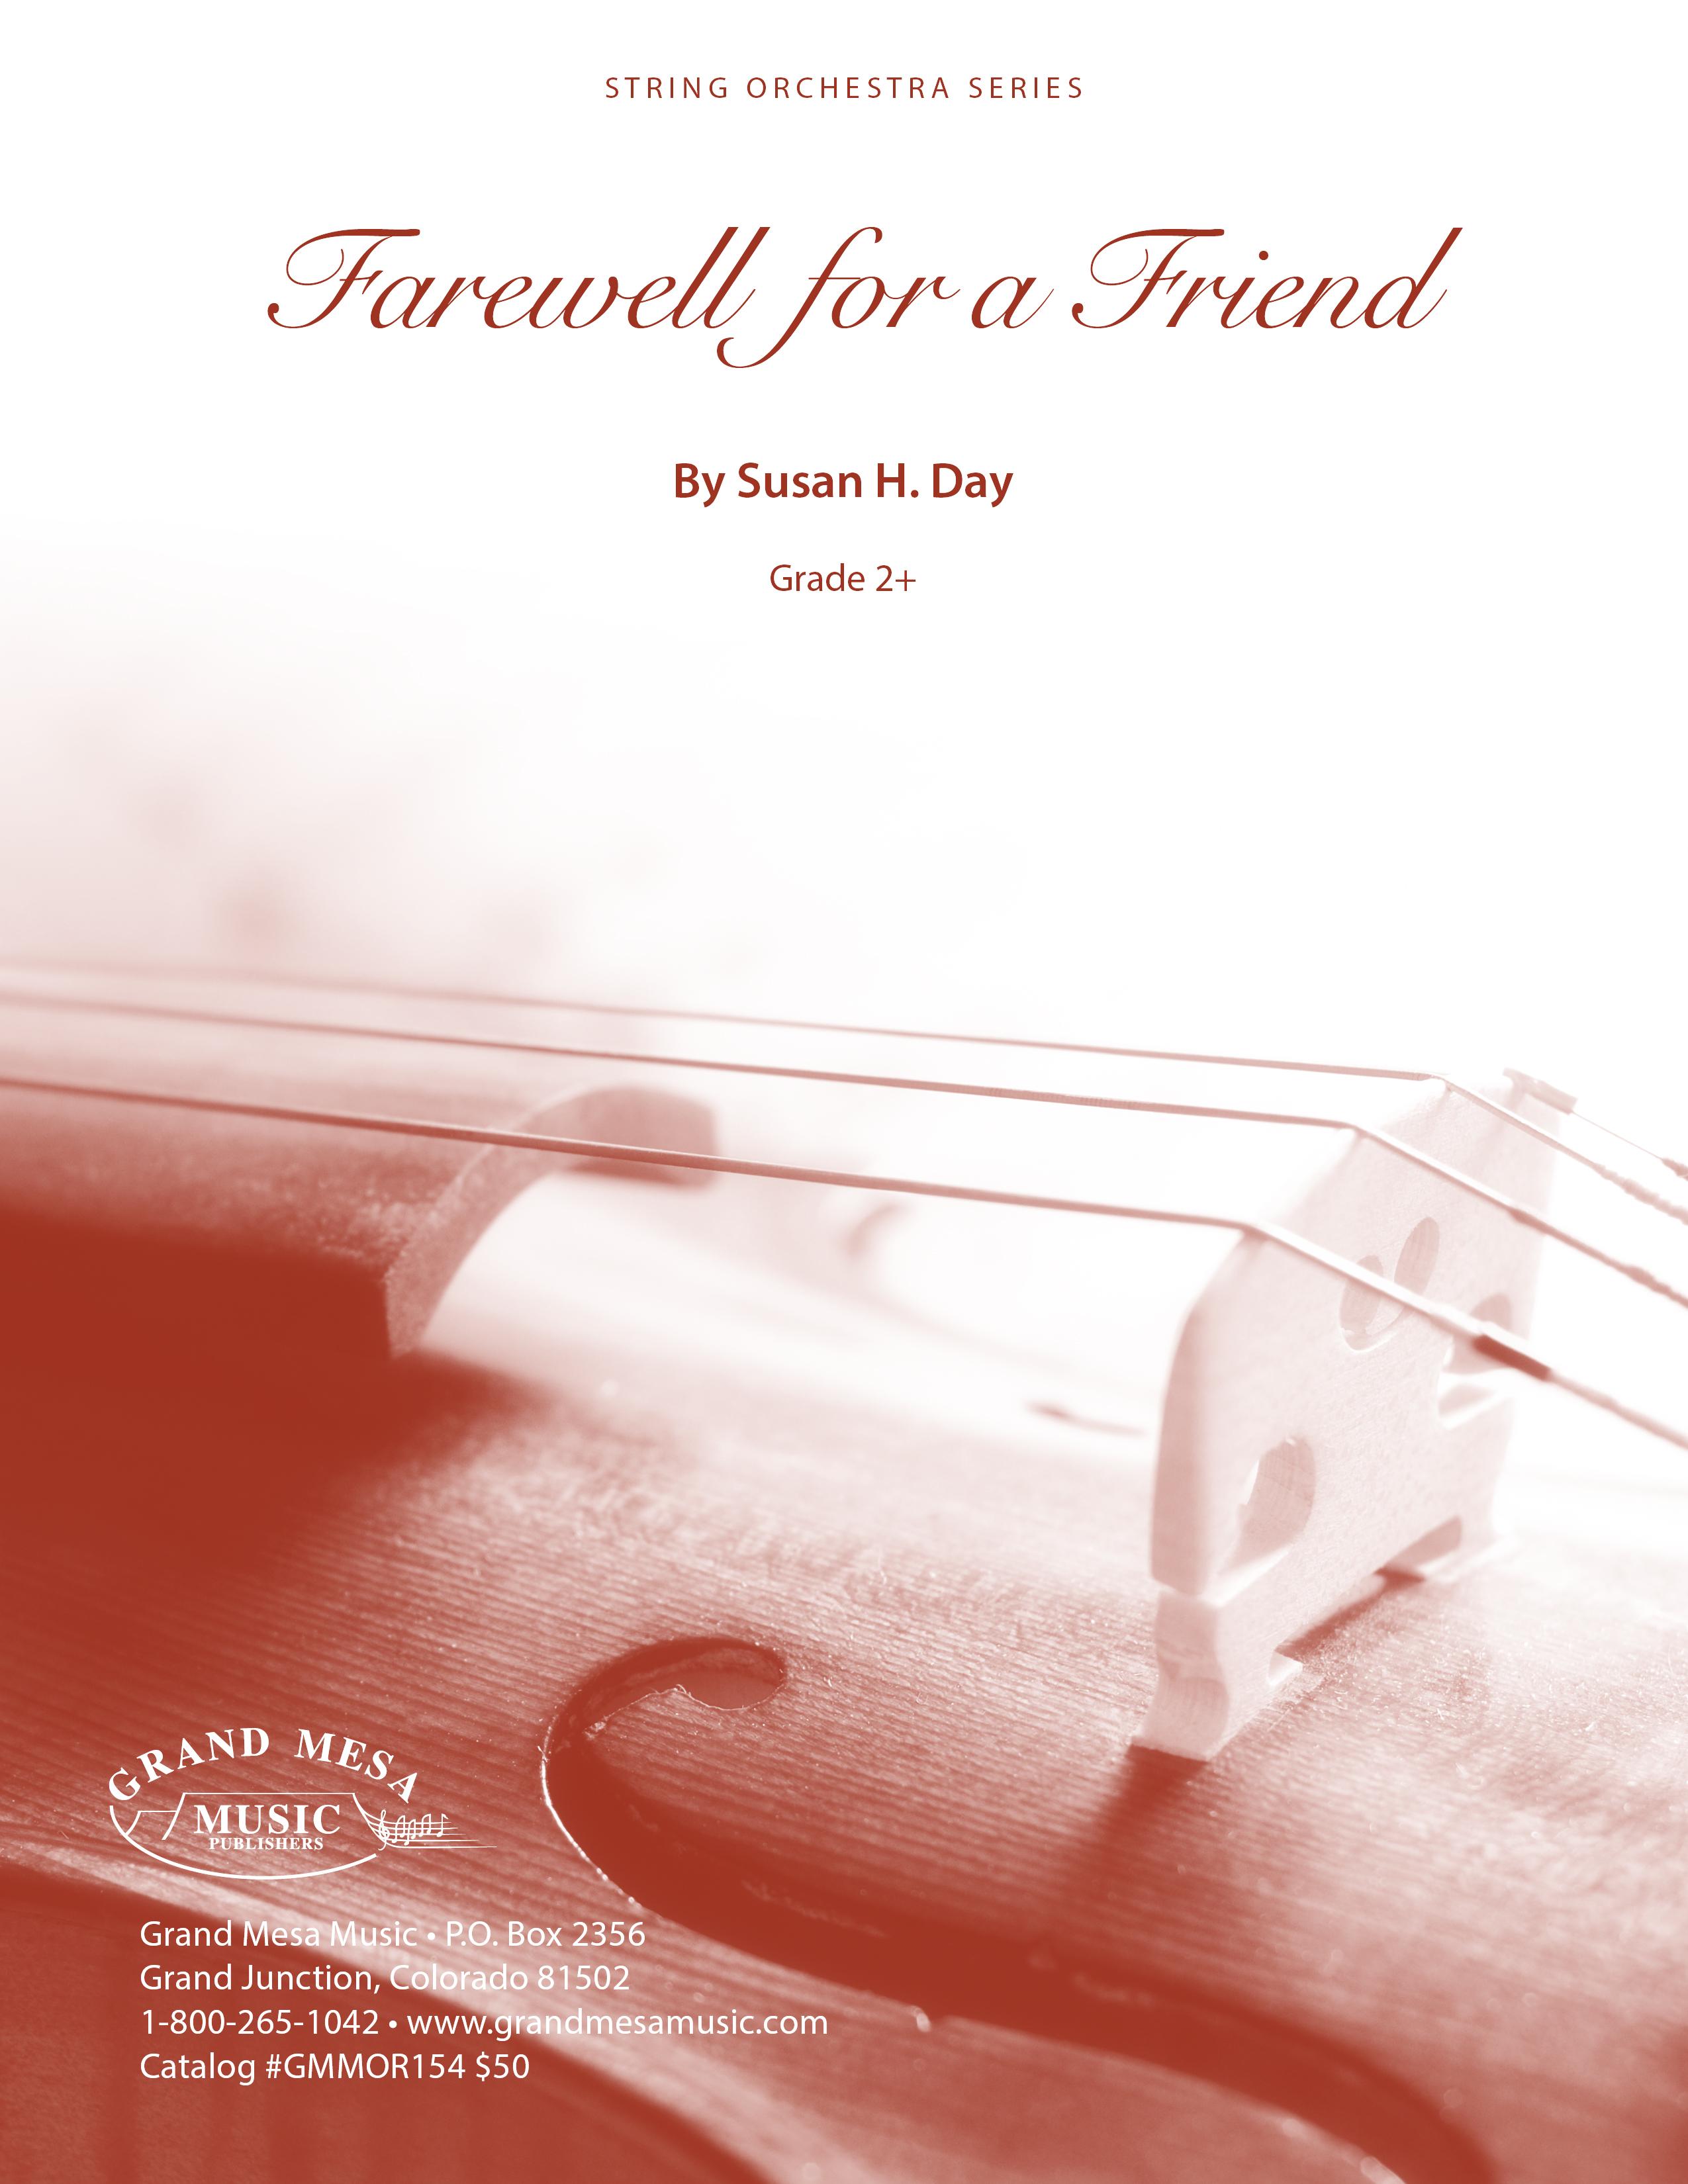 Farewell for a Friend